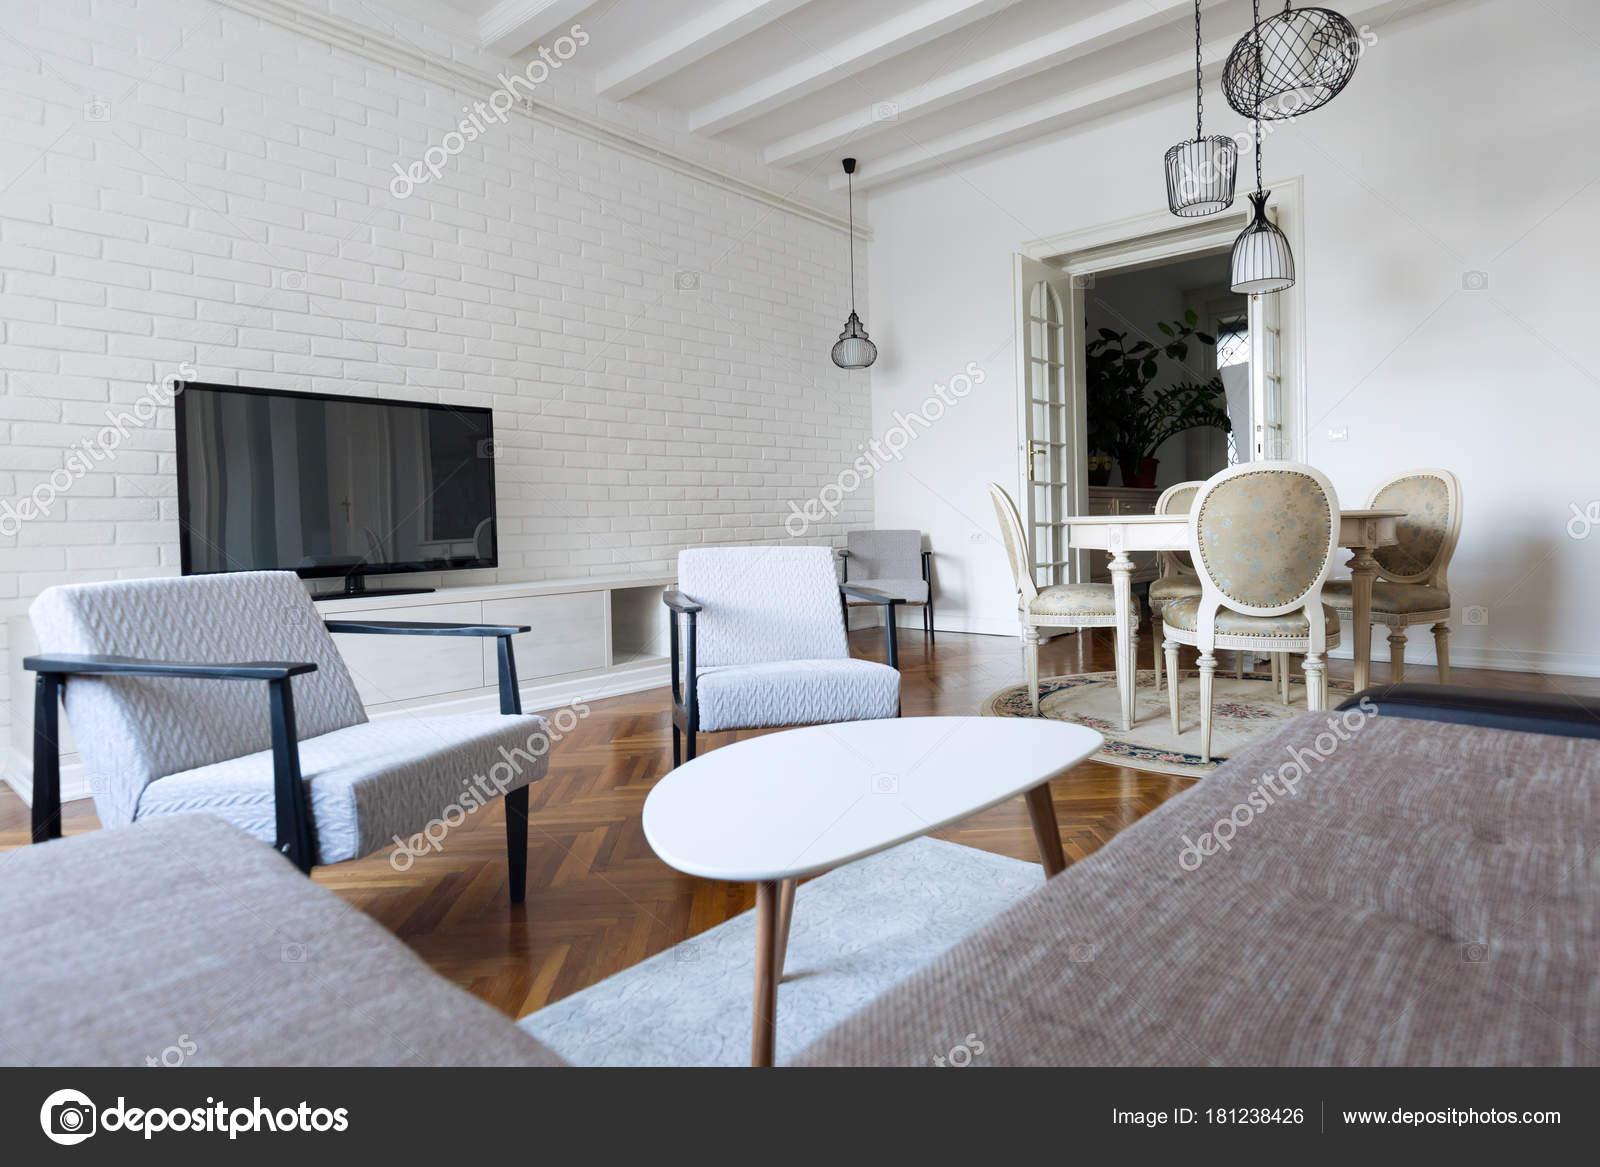 https://st3.depositphotos.com/5392356/18123/i/1600/depositphotos_181238426-stockafbeelding-modern-interieur-woonkamer-met-het.jpg